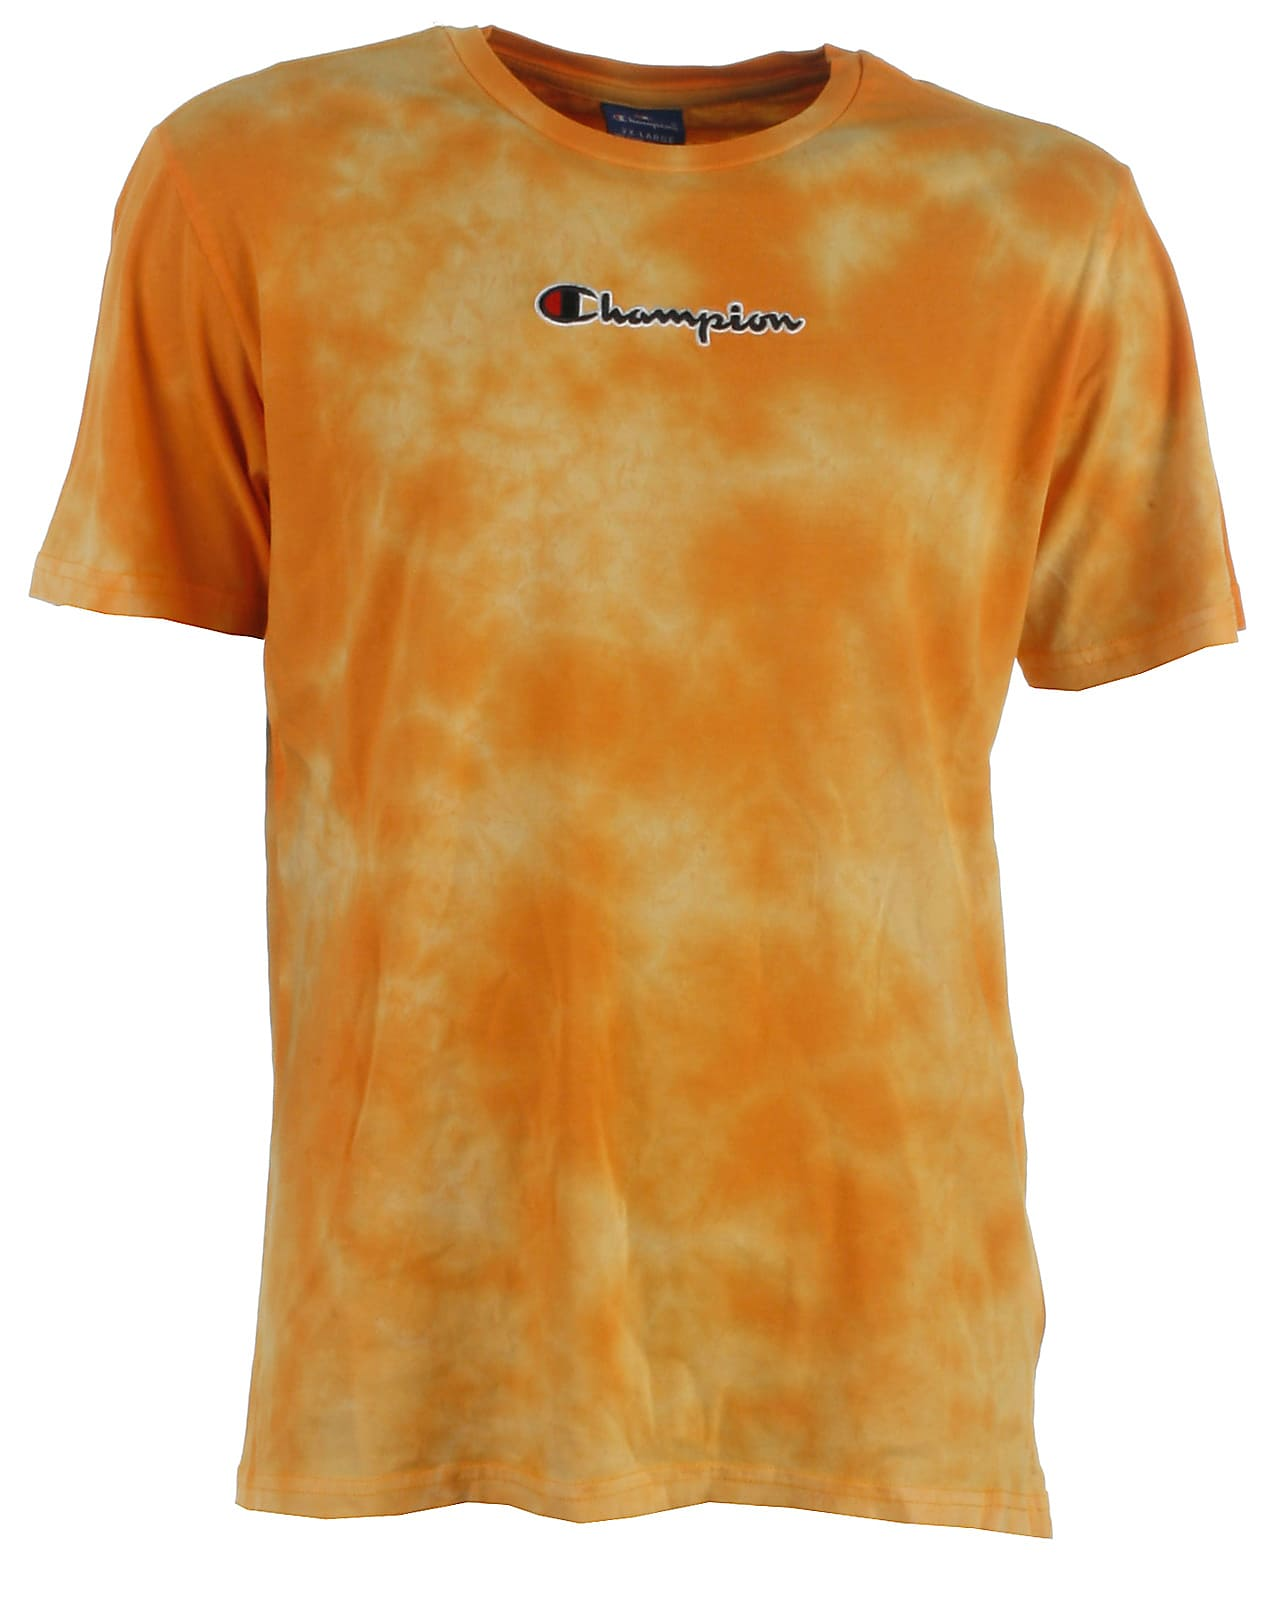 Image of Champion t-shirt s/s, gld